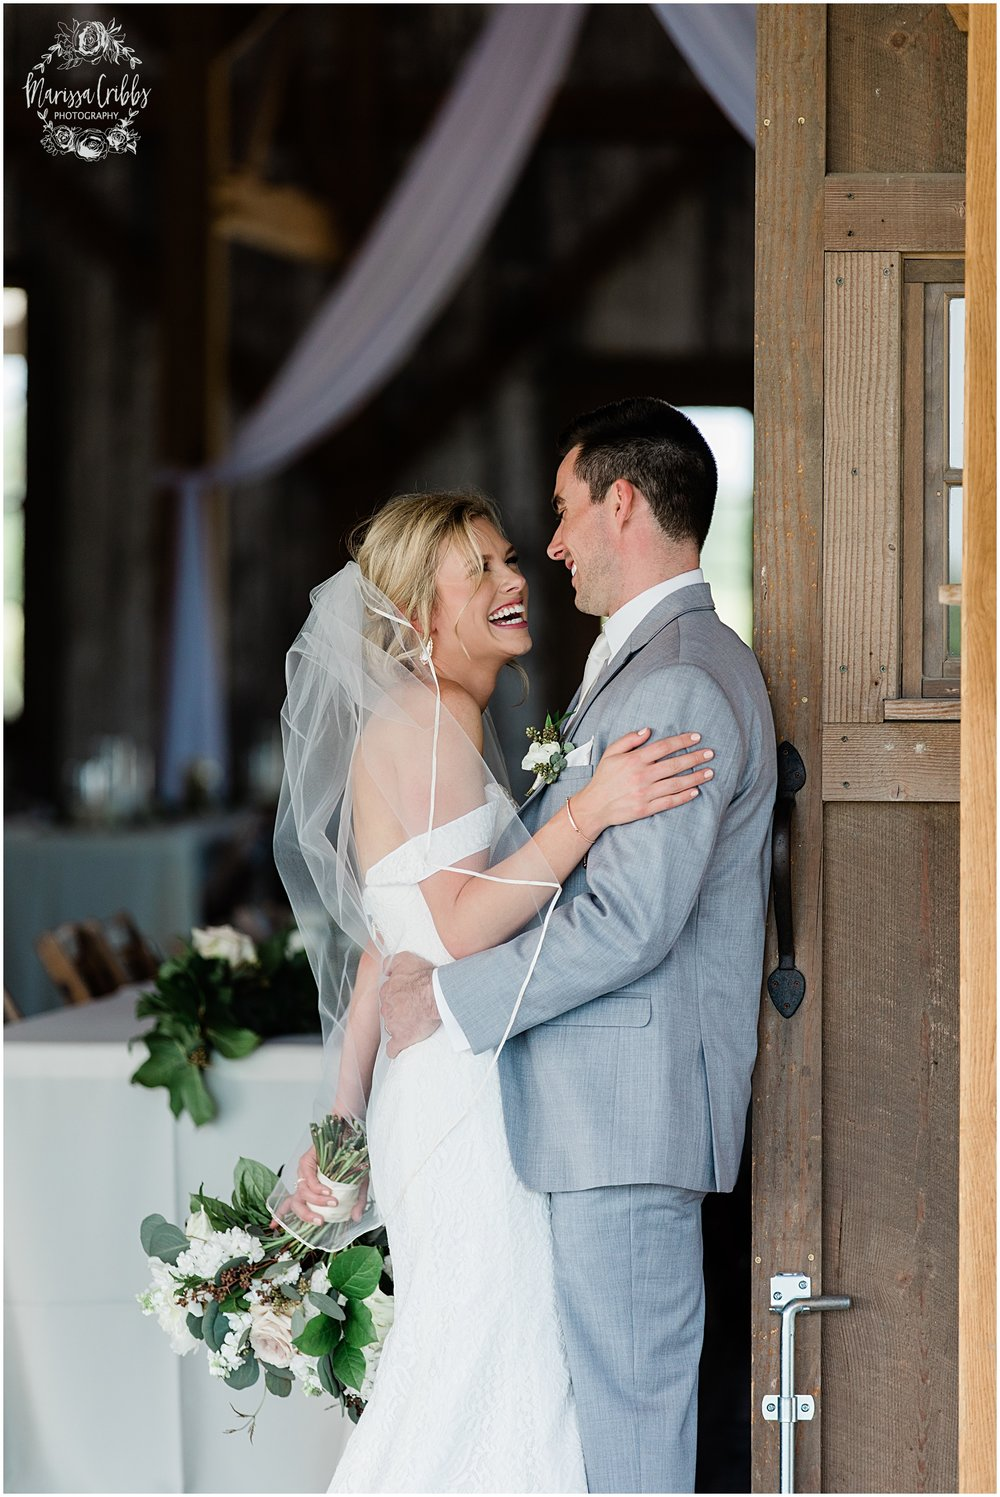 RHODES WEDDING | WESTON RED BARN FARM | MARISSA CRIBBS PHOTOGRAPHY_5247.jpg